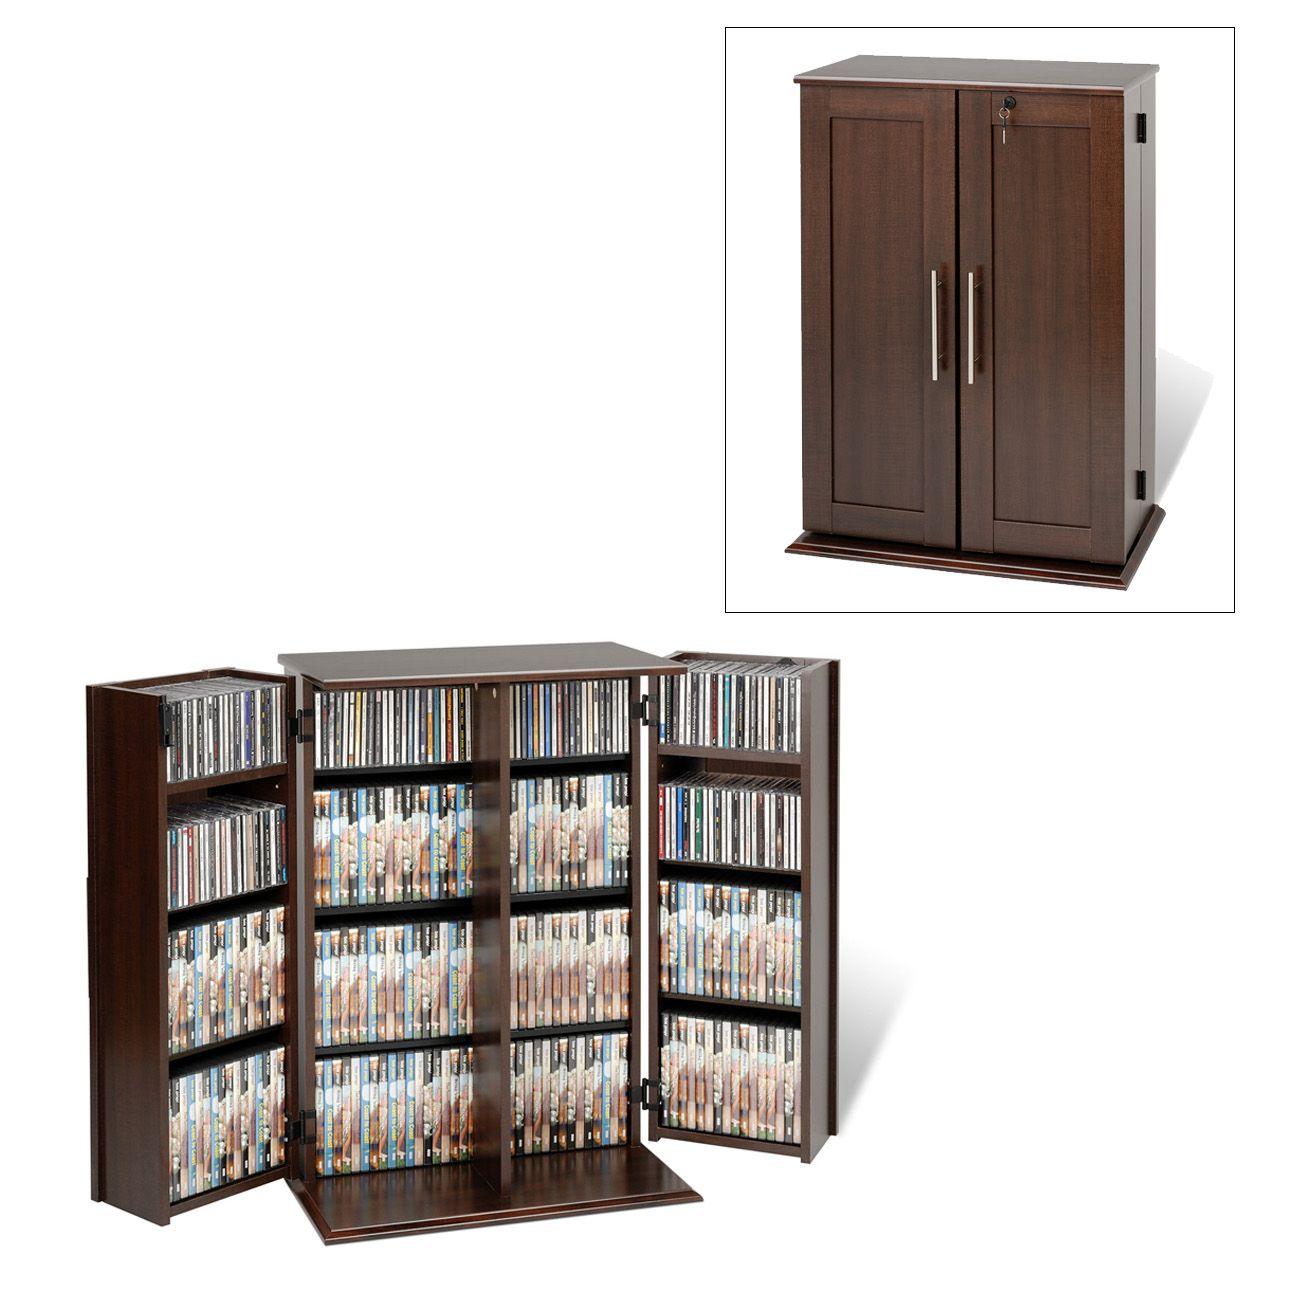 Prepac Furniture Locking Multimedia Storage Cabinet With Shaker Doors Lowe S Canada Prepac Furniture Shaker Doors Storage Cabinet